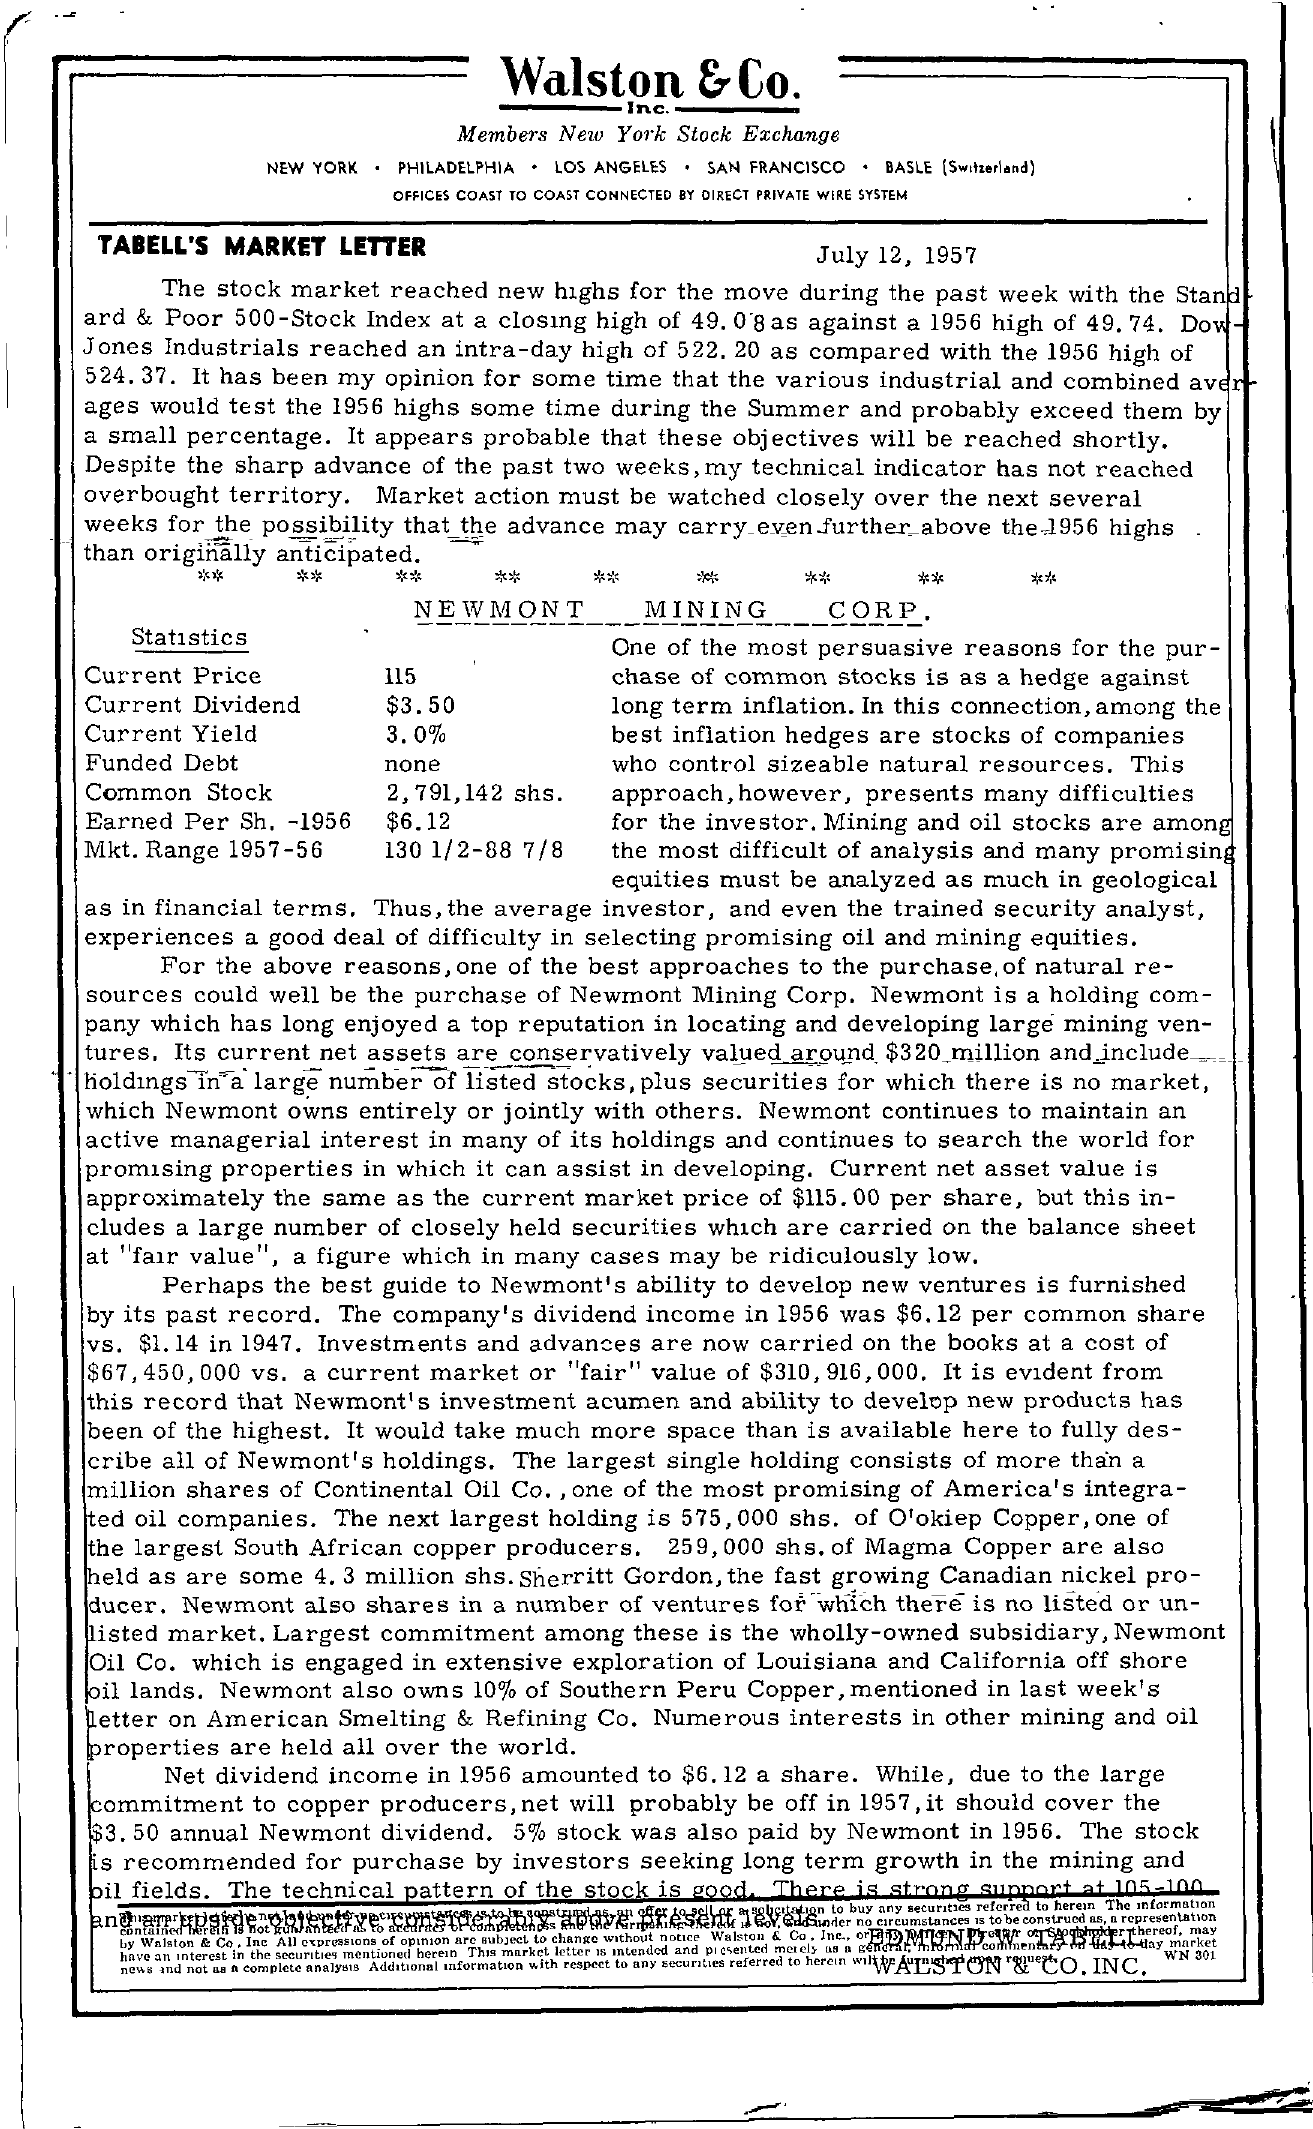 Tabell's Market Letter - July 12, 1957